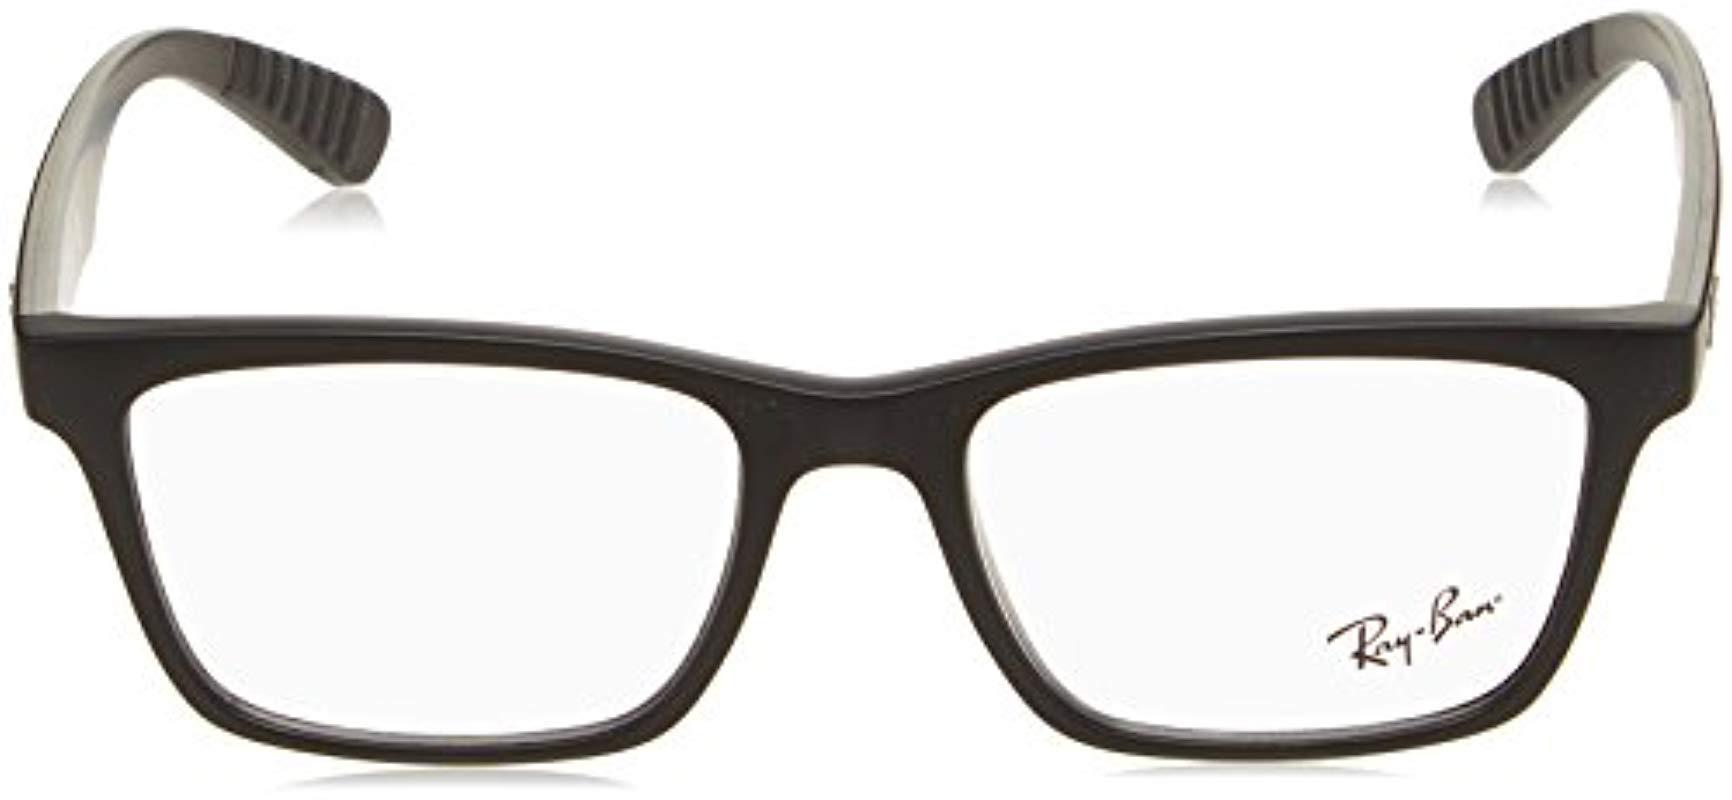 d989f199b41 Ray-Ban 0rx 7025 2077 53 Optical Frames